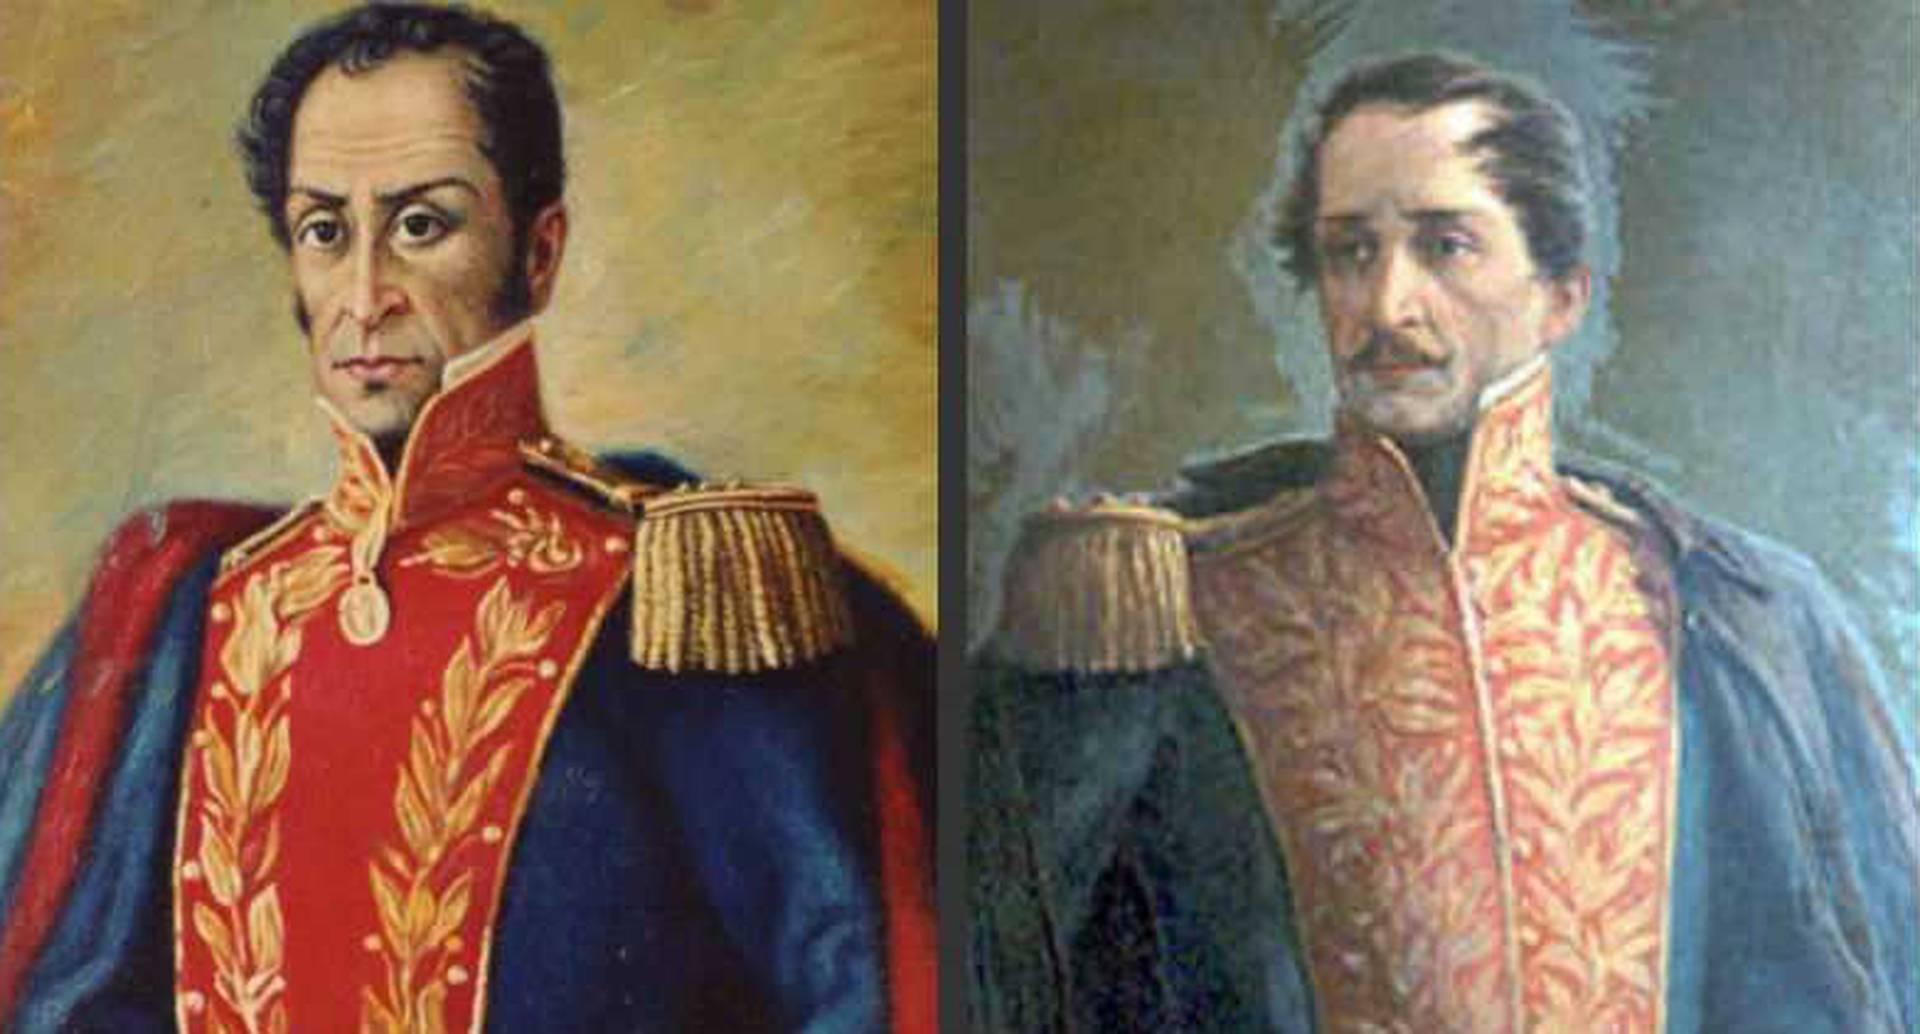 Simón Bolívar - Francisco de Paula Santander.